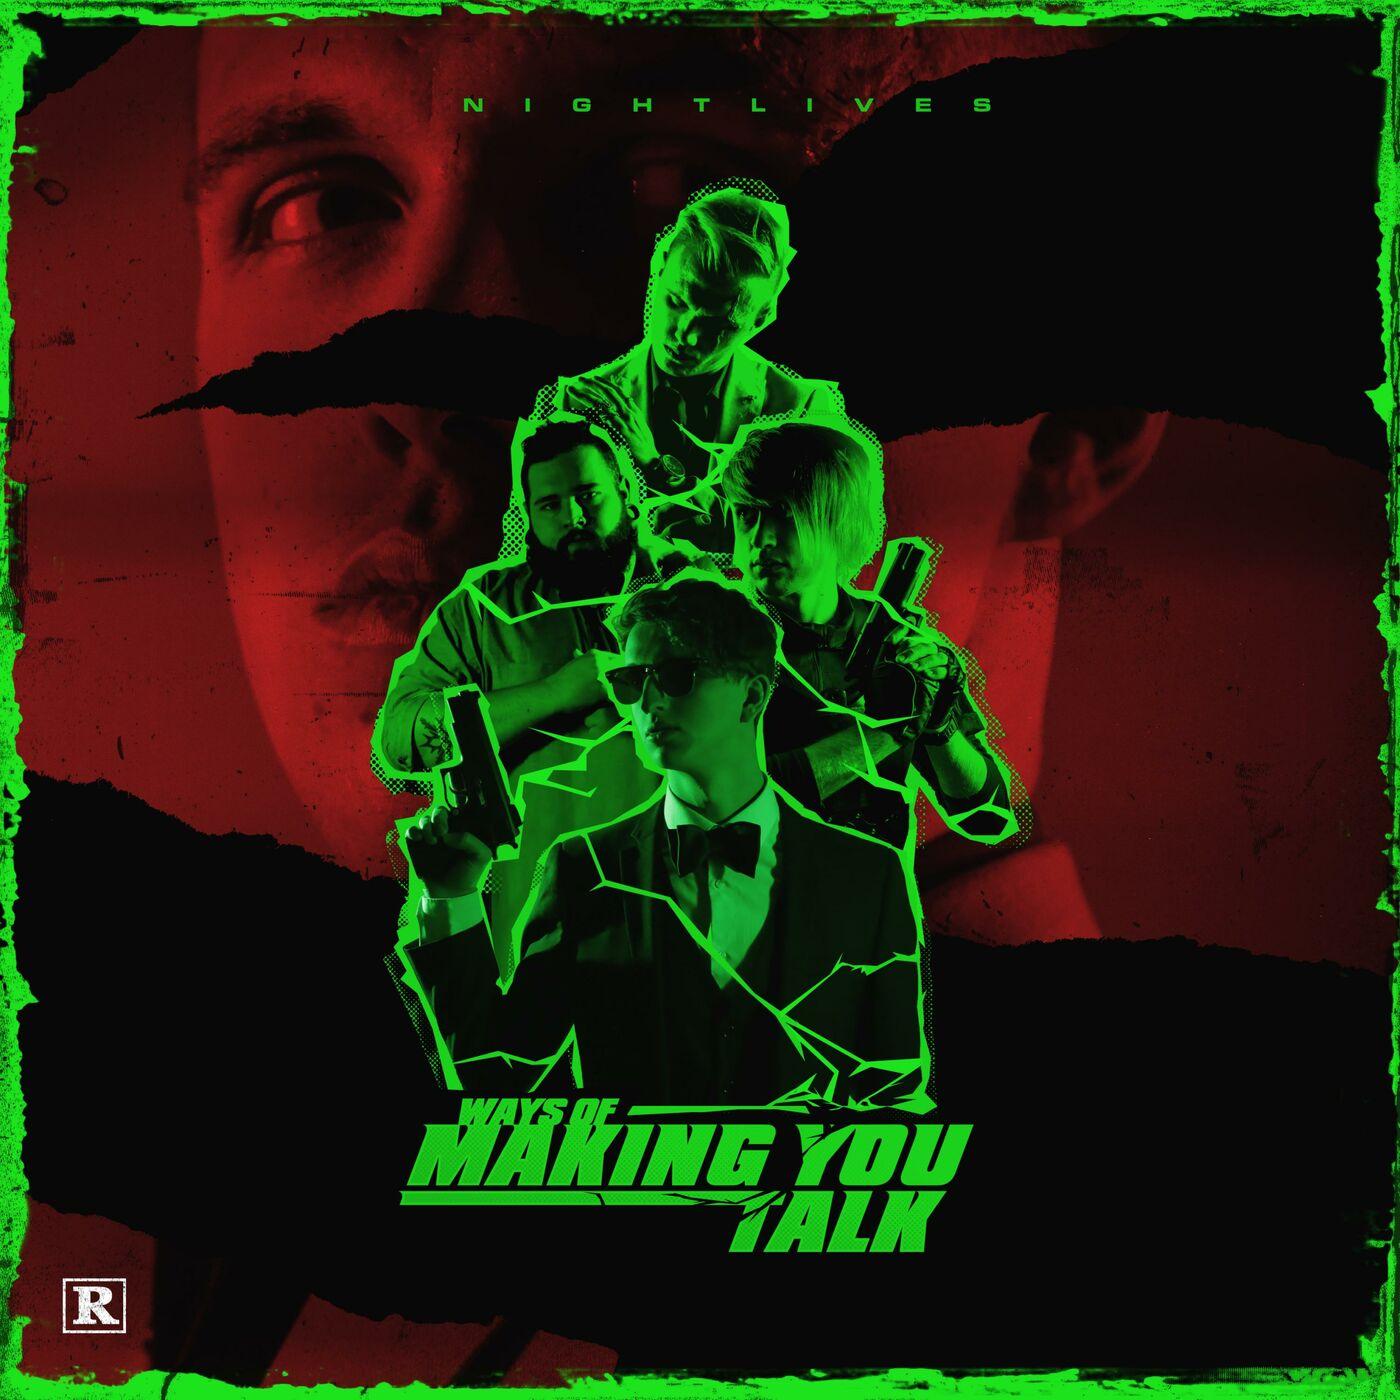 Nightlives - Ways of Making You Talk [single] (2019)